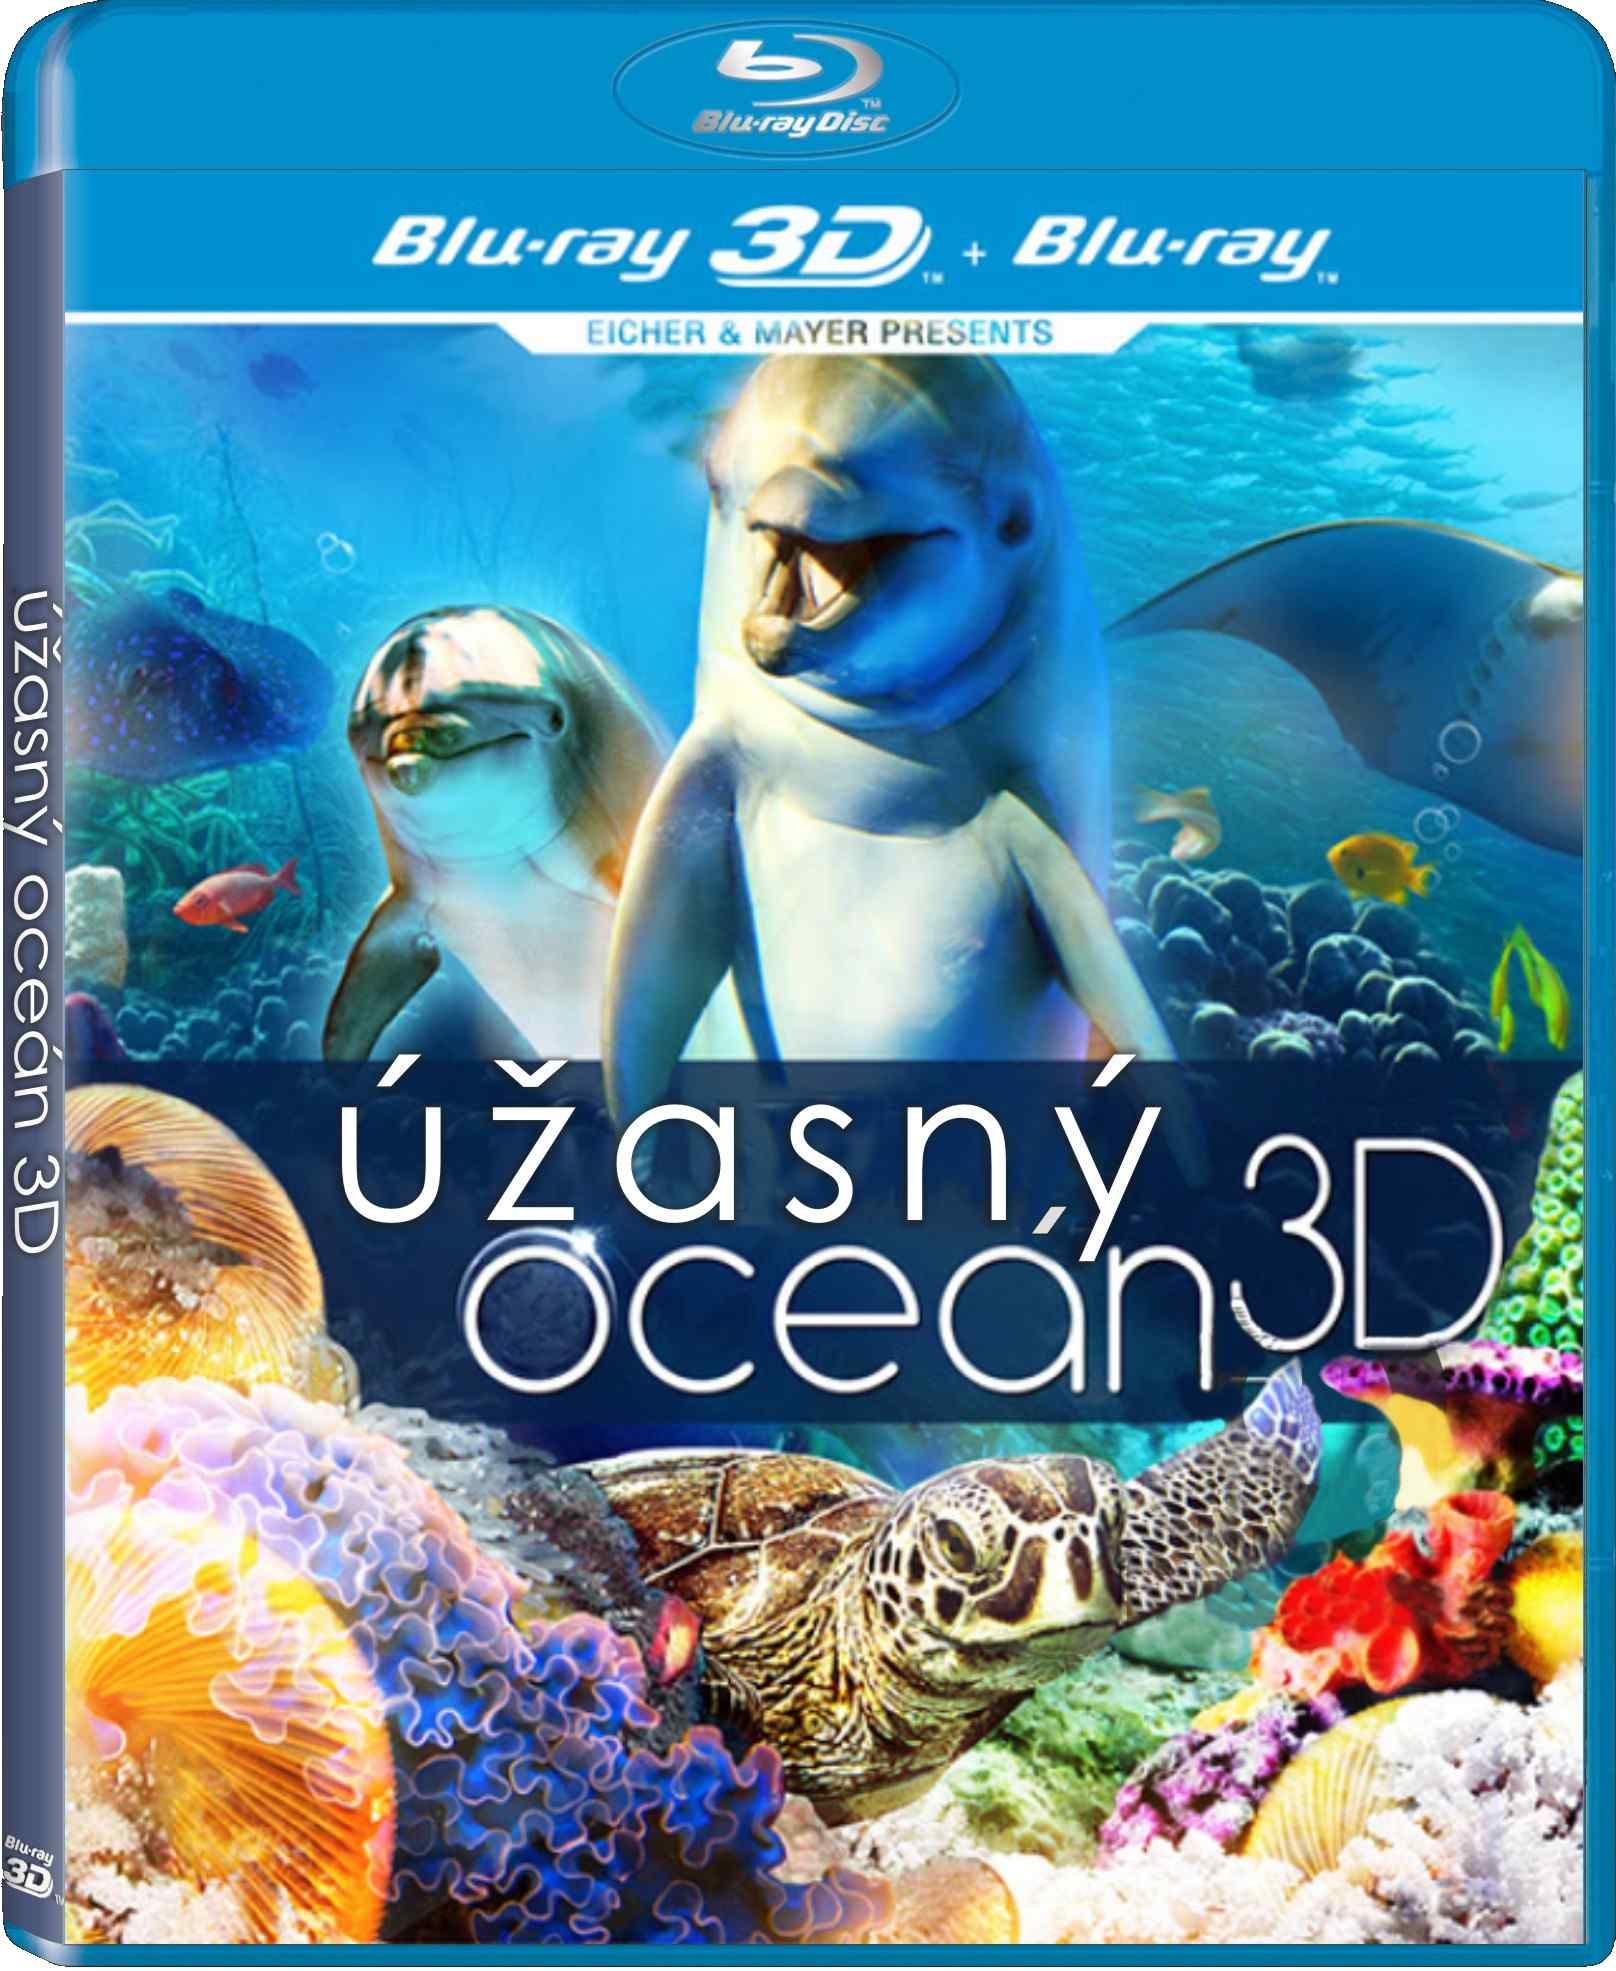 ÚŽASNÝ OCEÁN - Blu-ray 3D + 2D